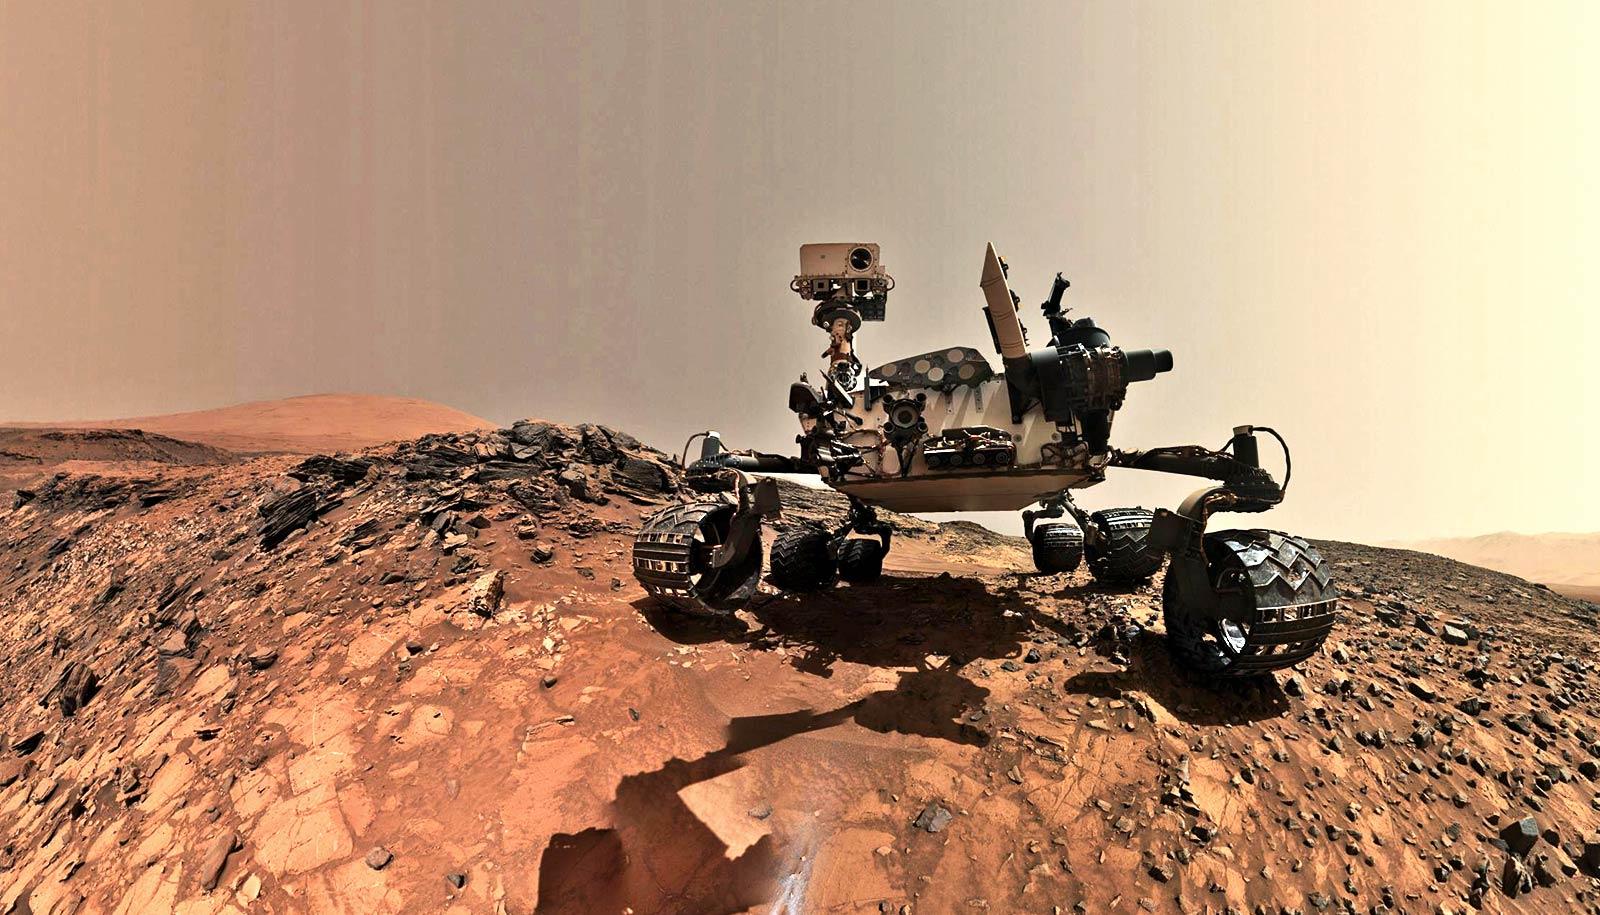 What do quakes on Mars feel like?